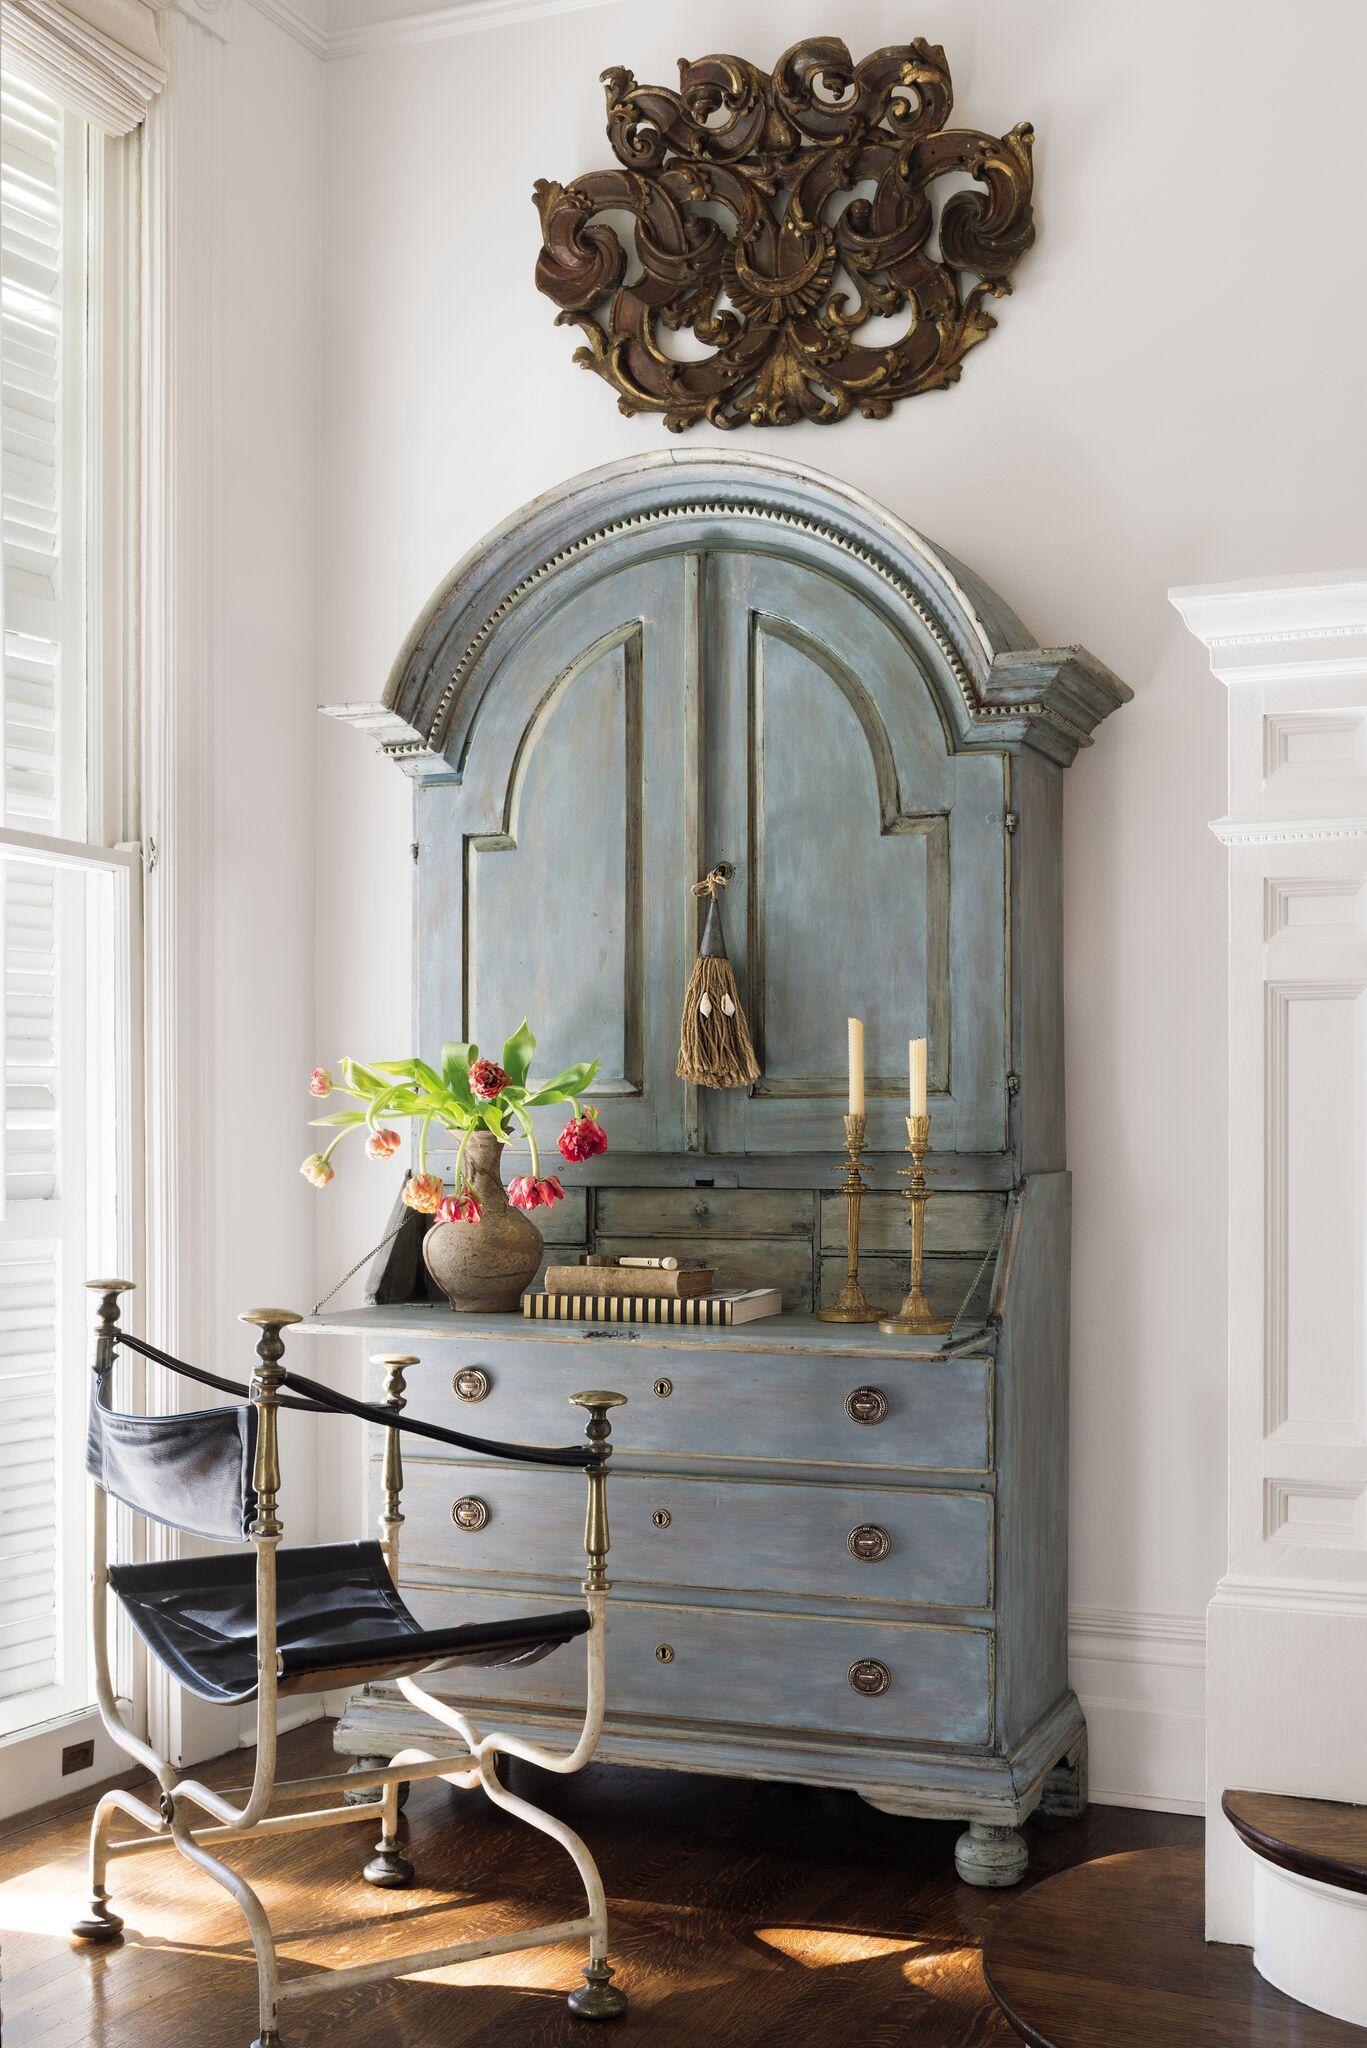 Beautiful blue 18th century Swedish secretary and vintage Savonarola chair make a stair landing functional for storage and correspondence. Tara Shaw designed this space. #tarashaw #swedishsecretary #swedishantiques #interiordesign #oldworldstyle #traditionaldecor